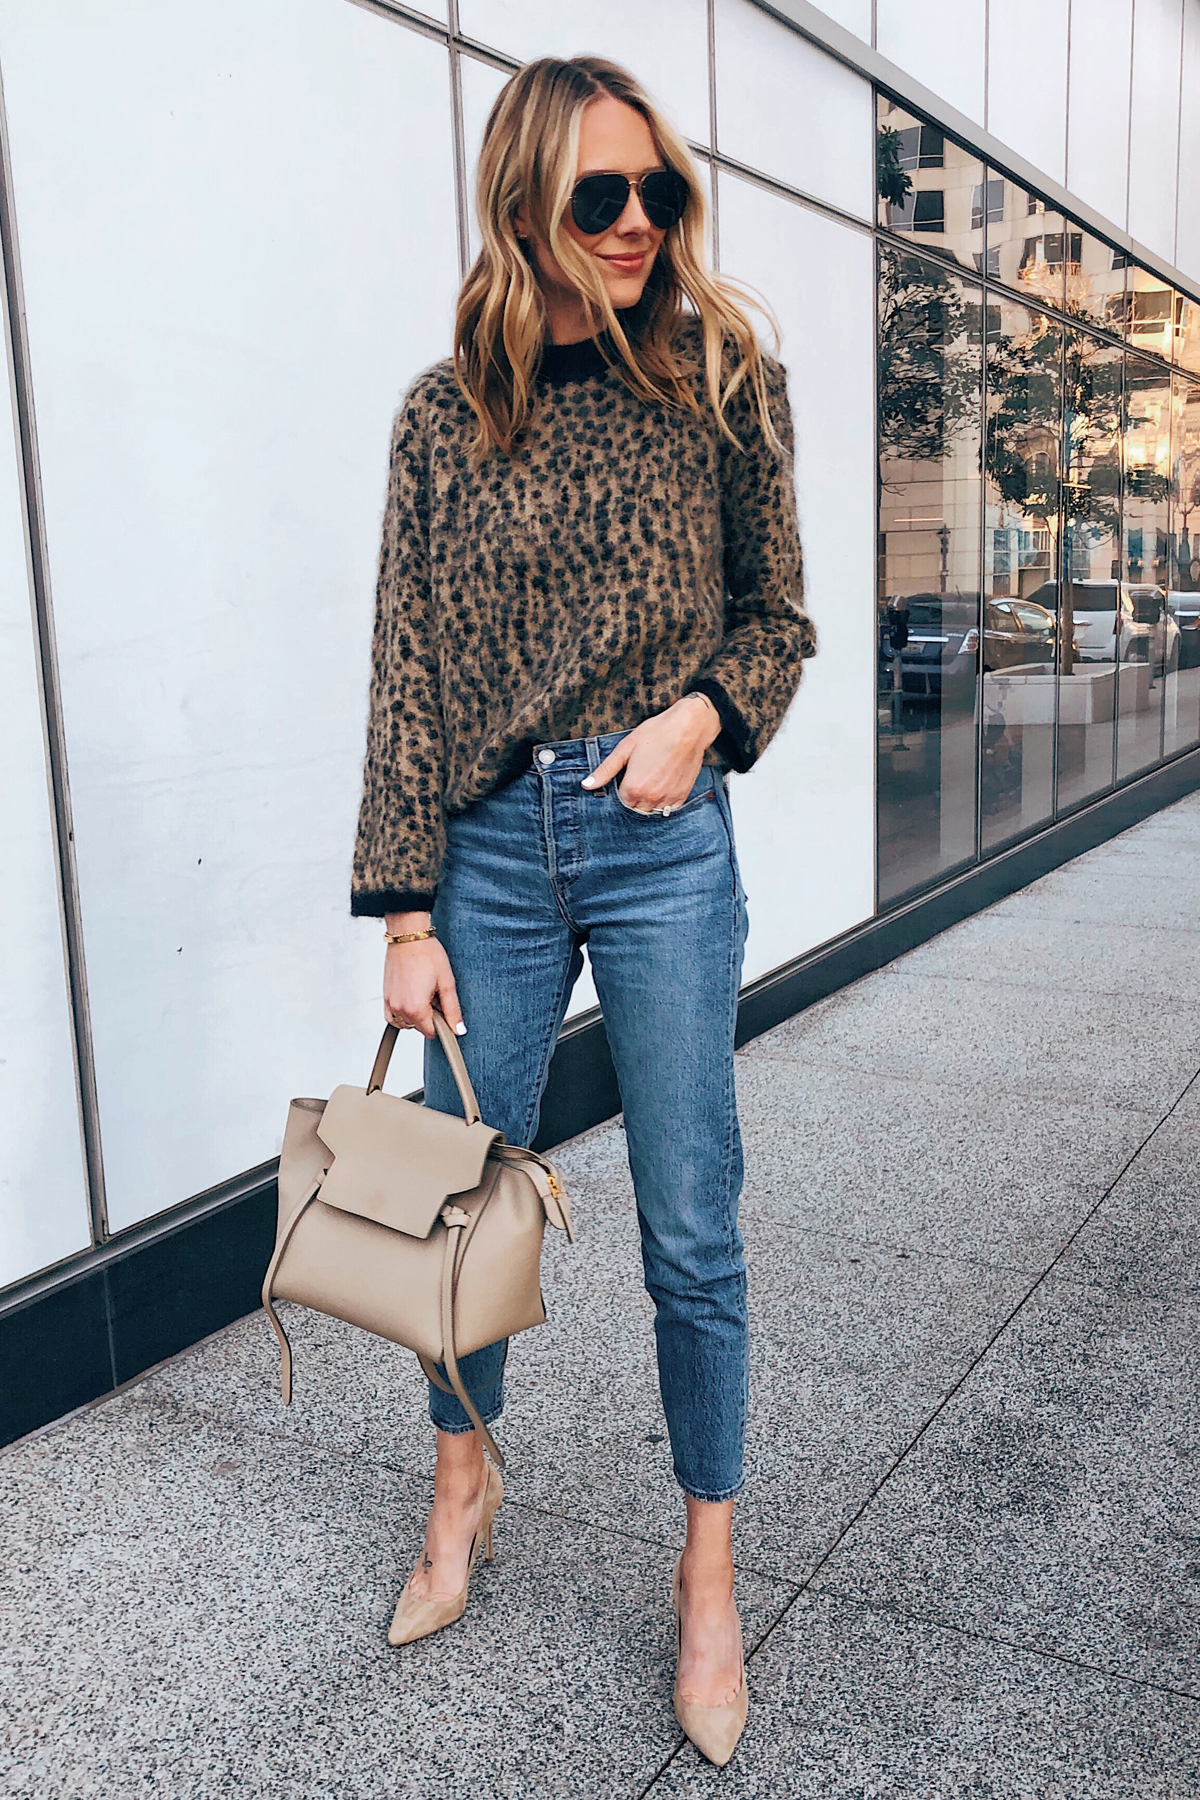 Fashion Jackson Wearing Leopard Sweater Levis Jeans Nude Pumps Celine Mini Belt Bag